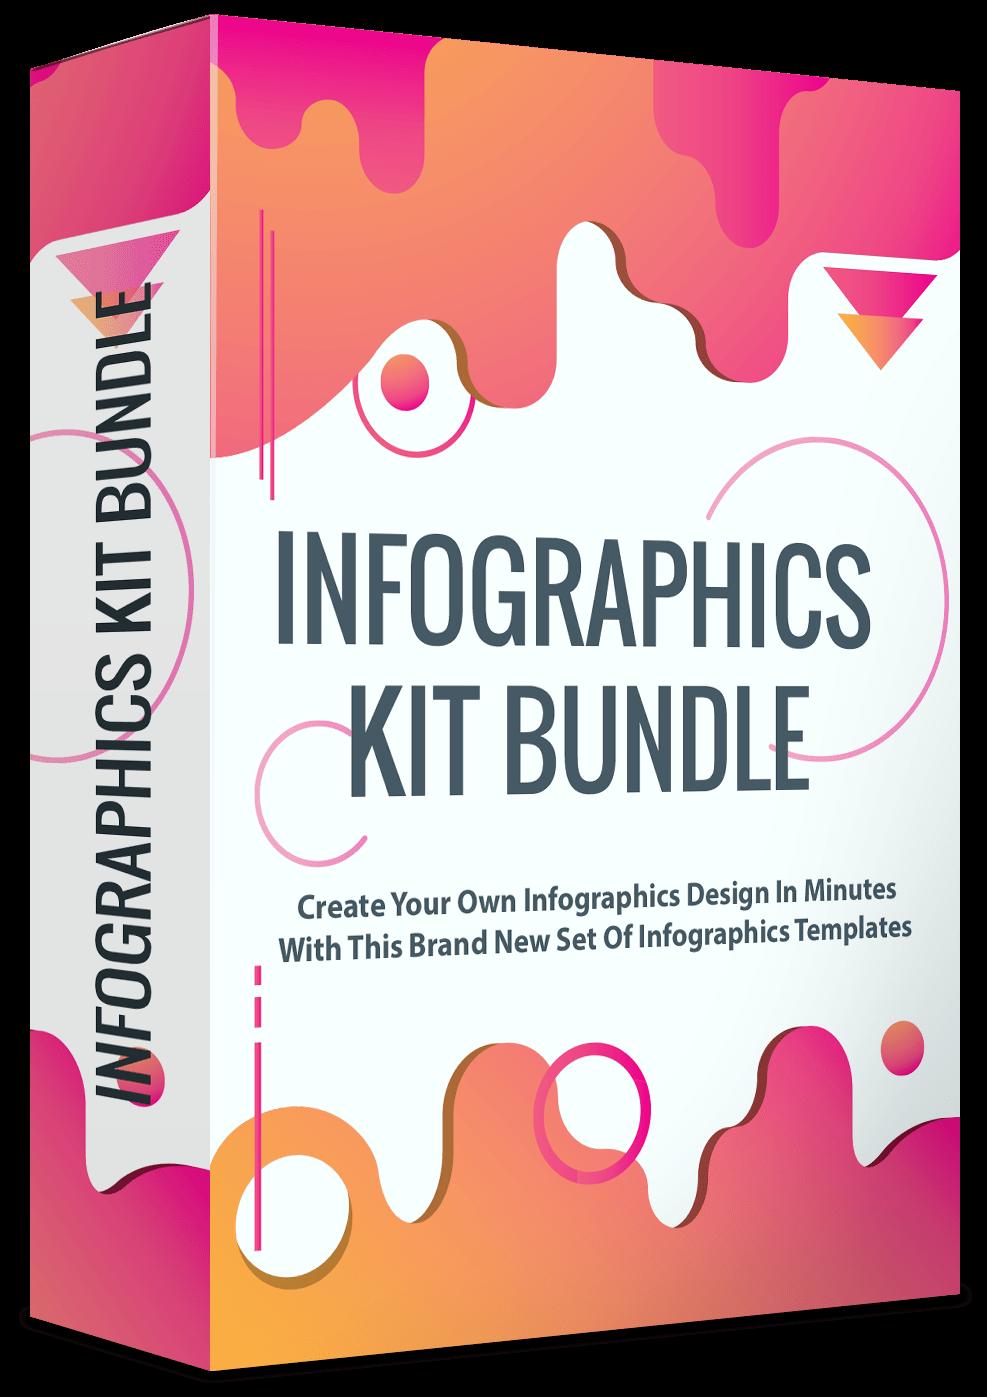 Infographics-kit-bundle-review-Logo